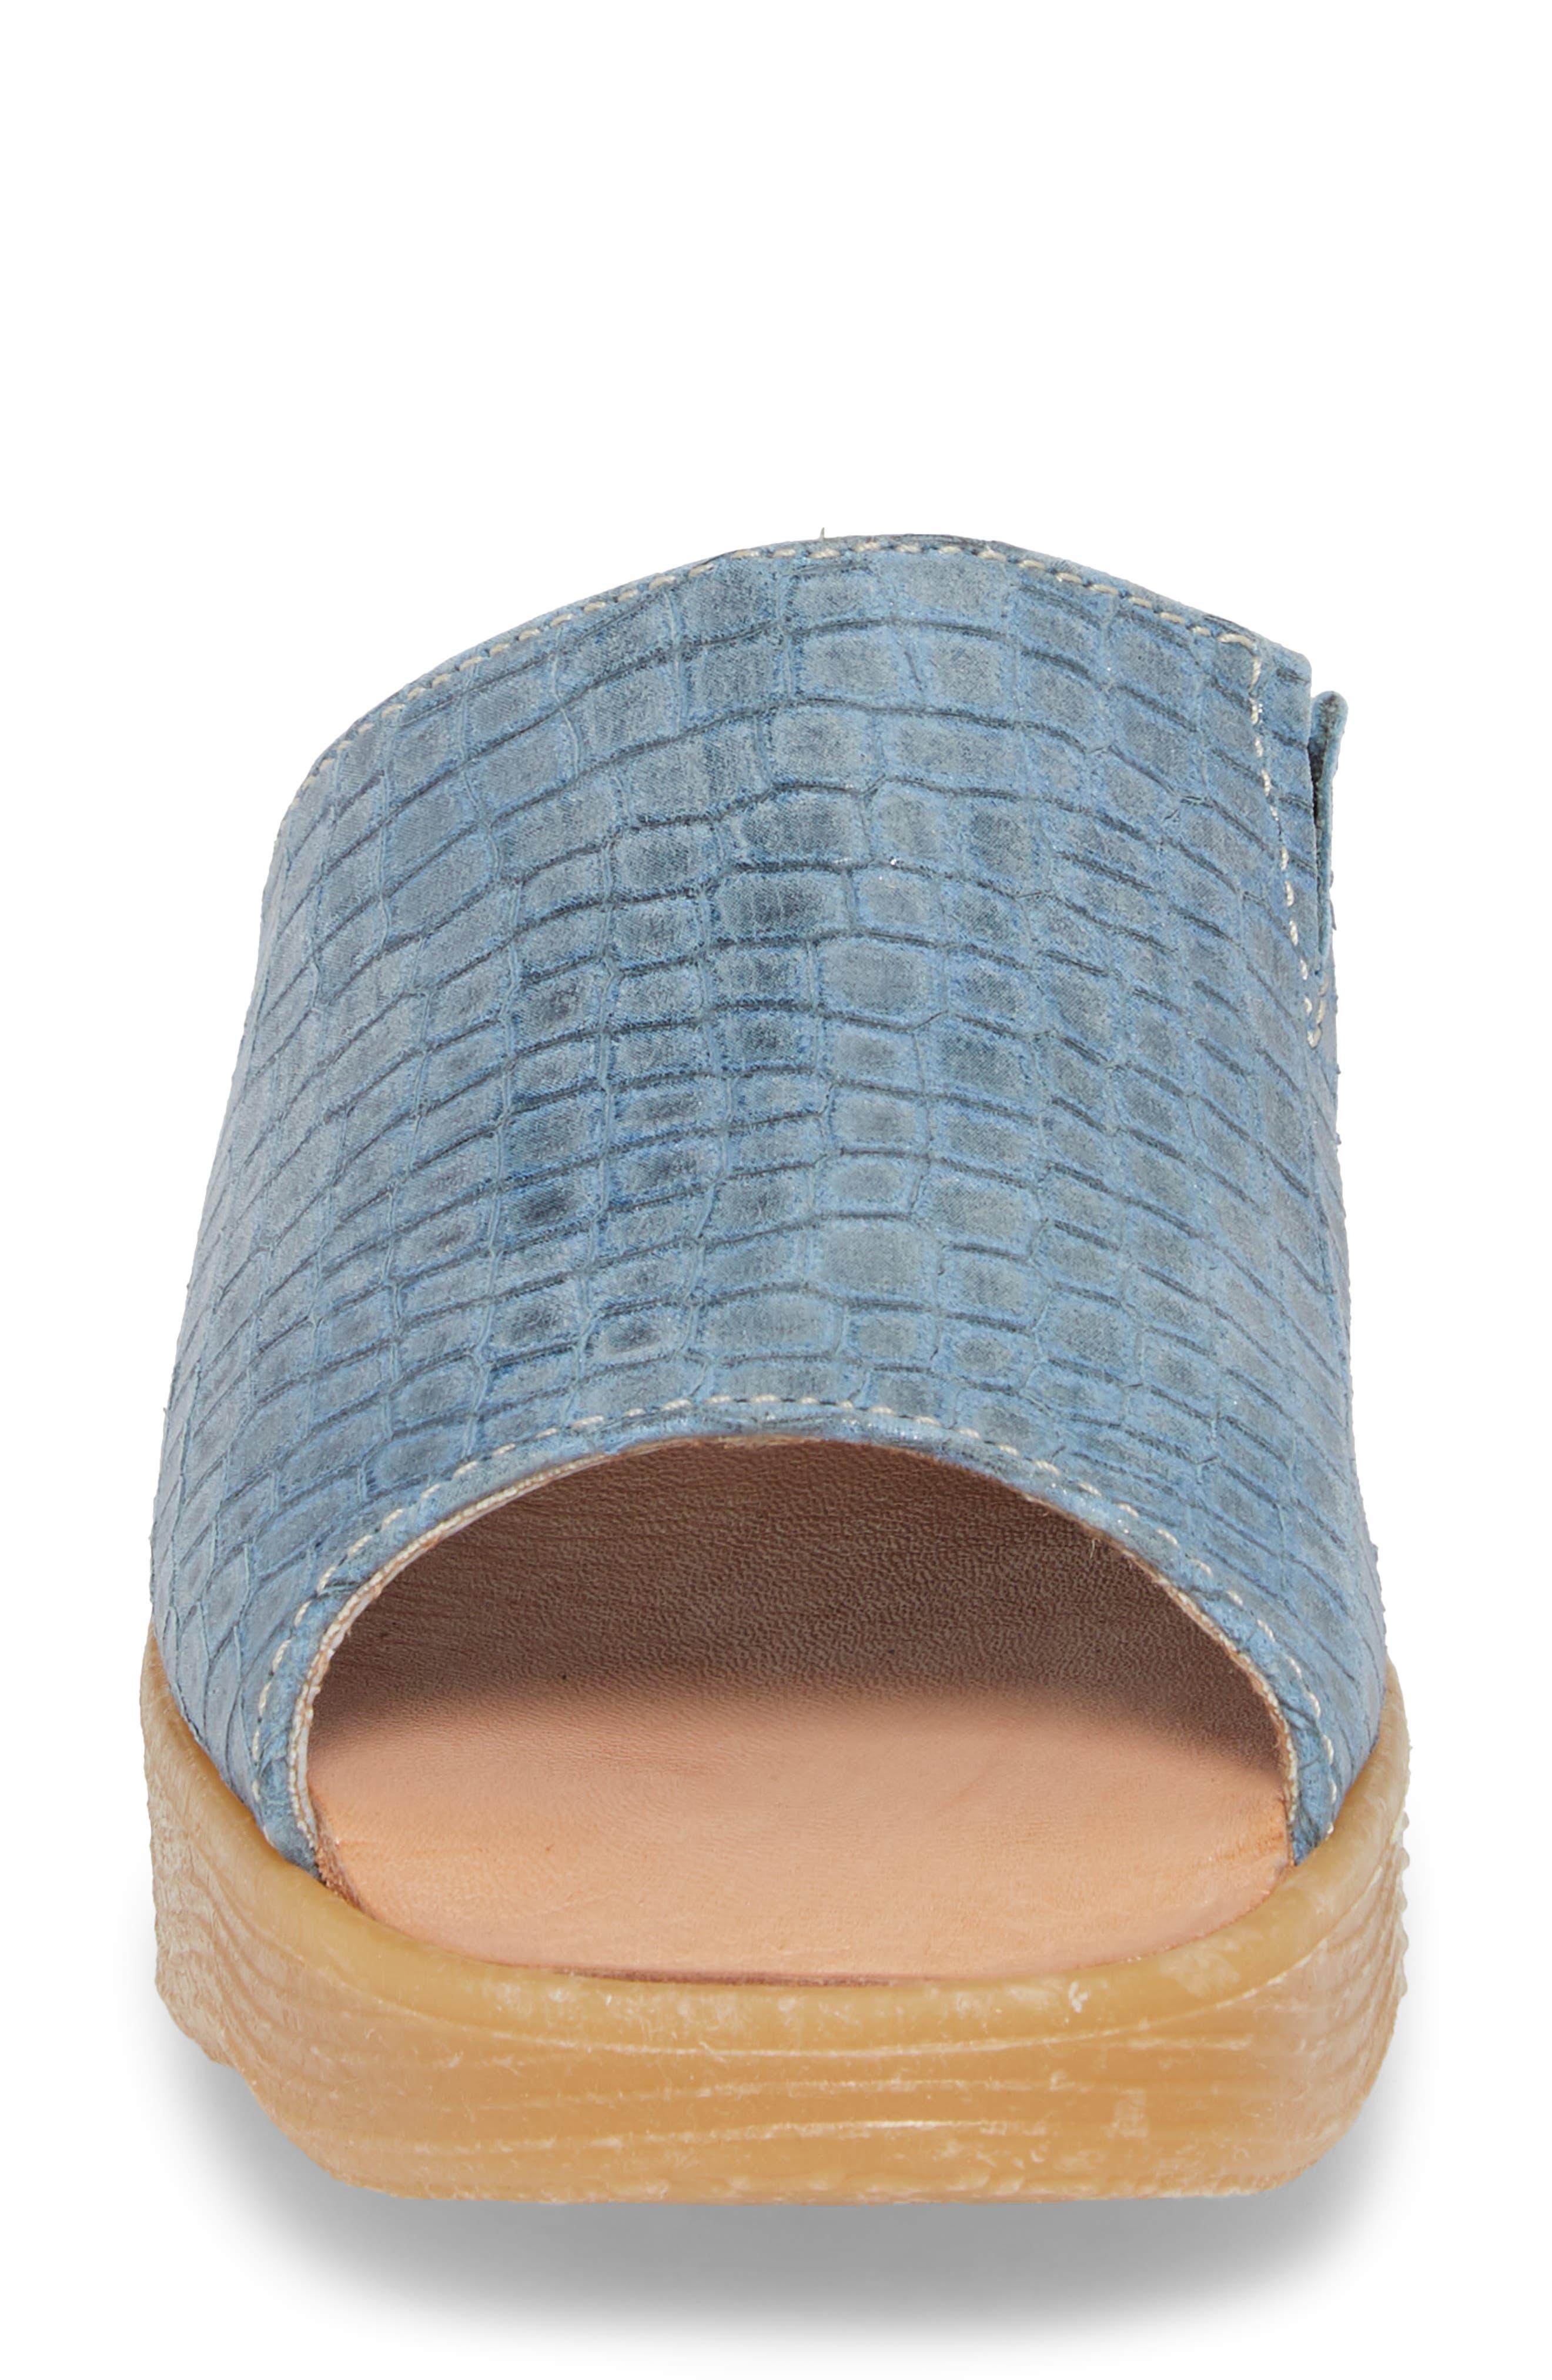 Slide N Sleek Wedge Slide Sandal,                             Alternate thumbnail 4, color,                             Aqua Croc Printed Leather